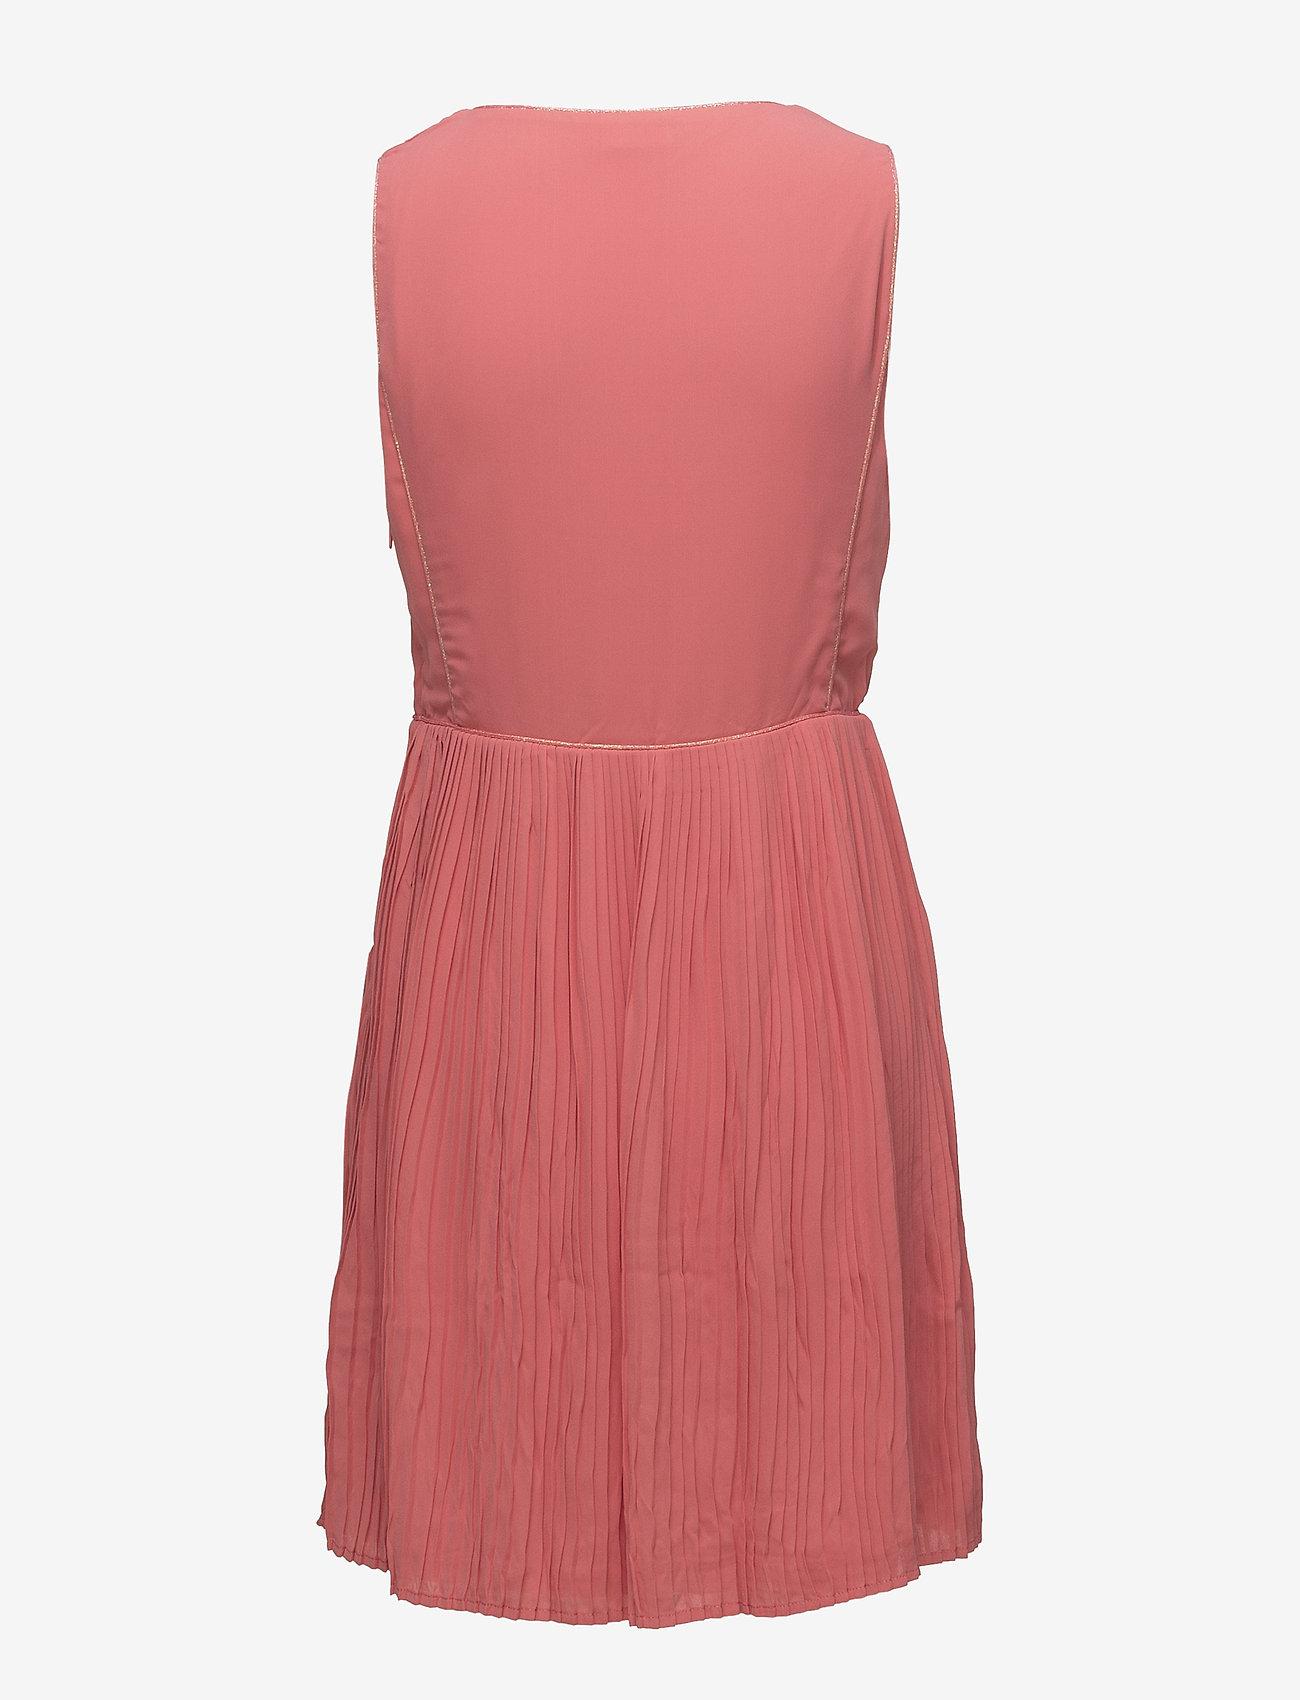 Vila - VILILLA S/L DRESS - midi dresses - spiced coral - 1